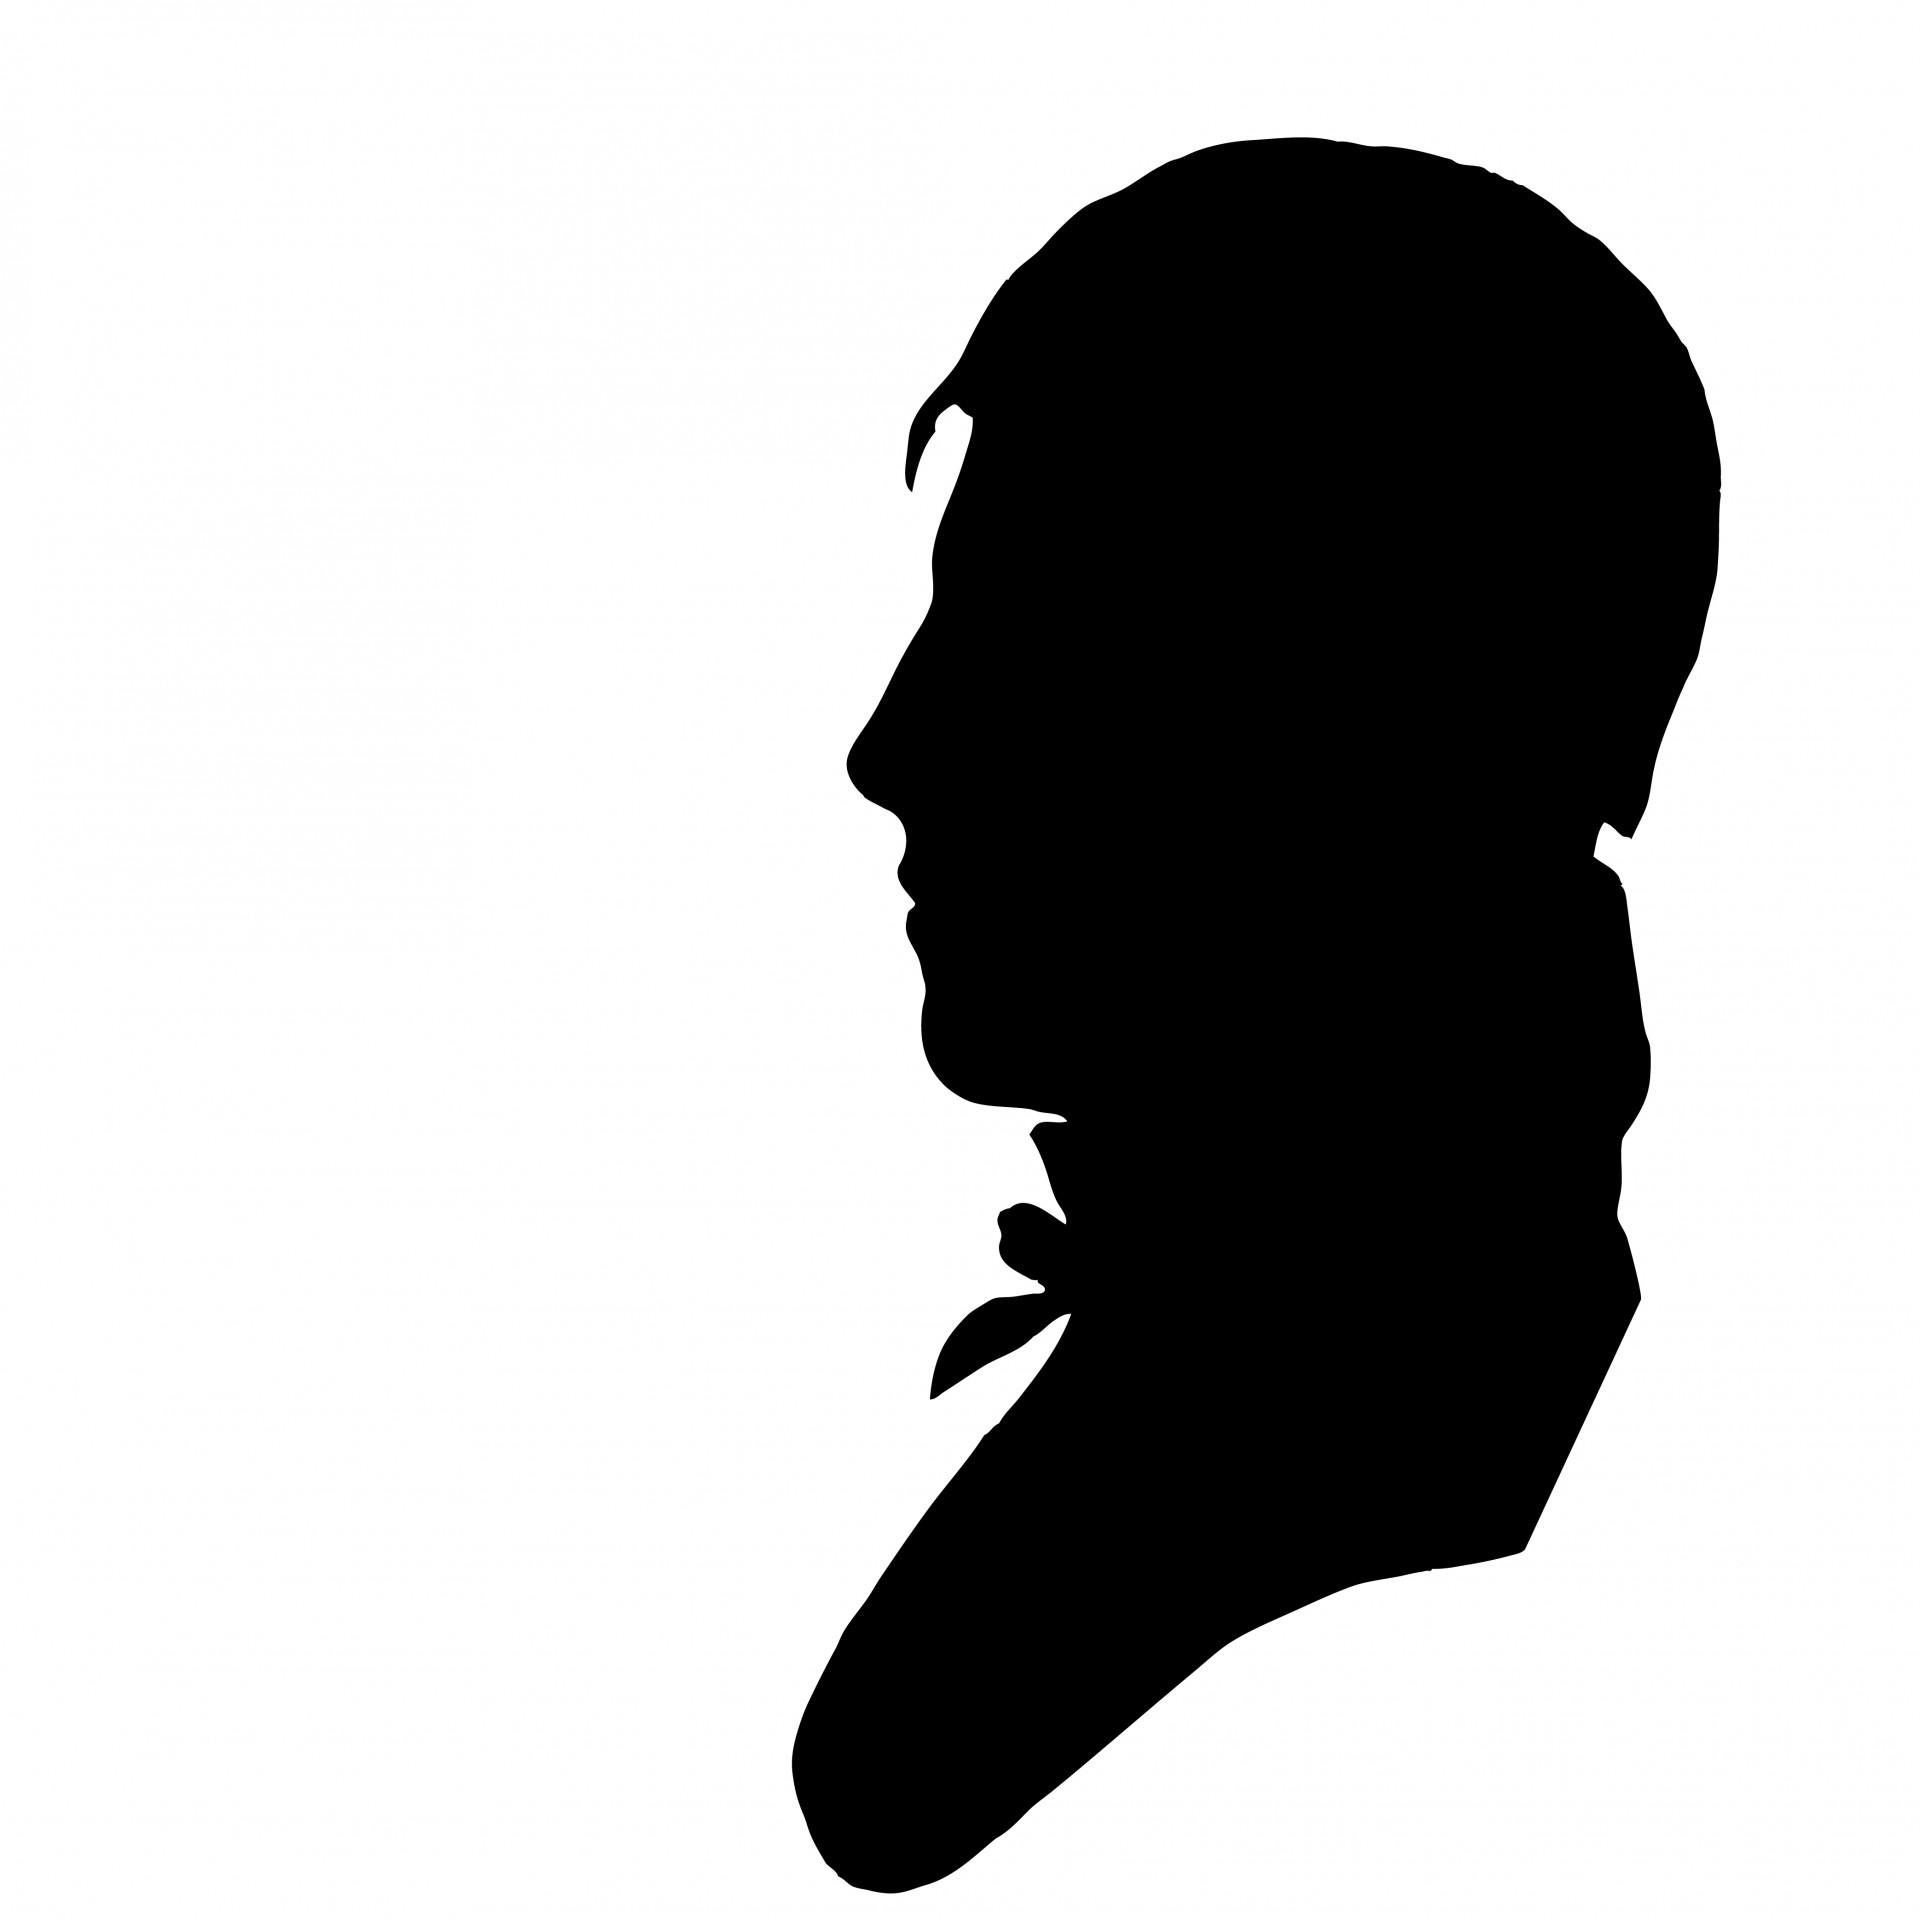 1920x1920 Vintage Male Profile Silhouette Free Stock Photo